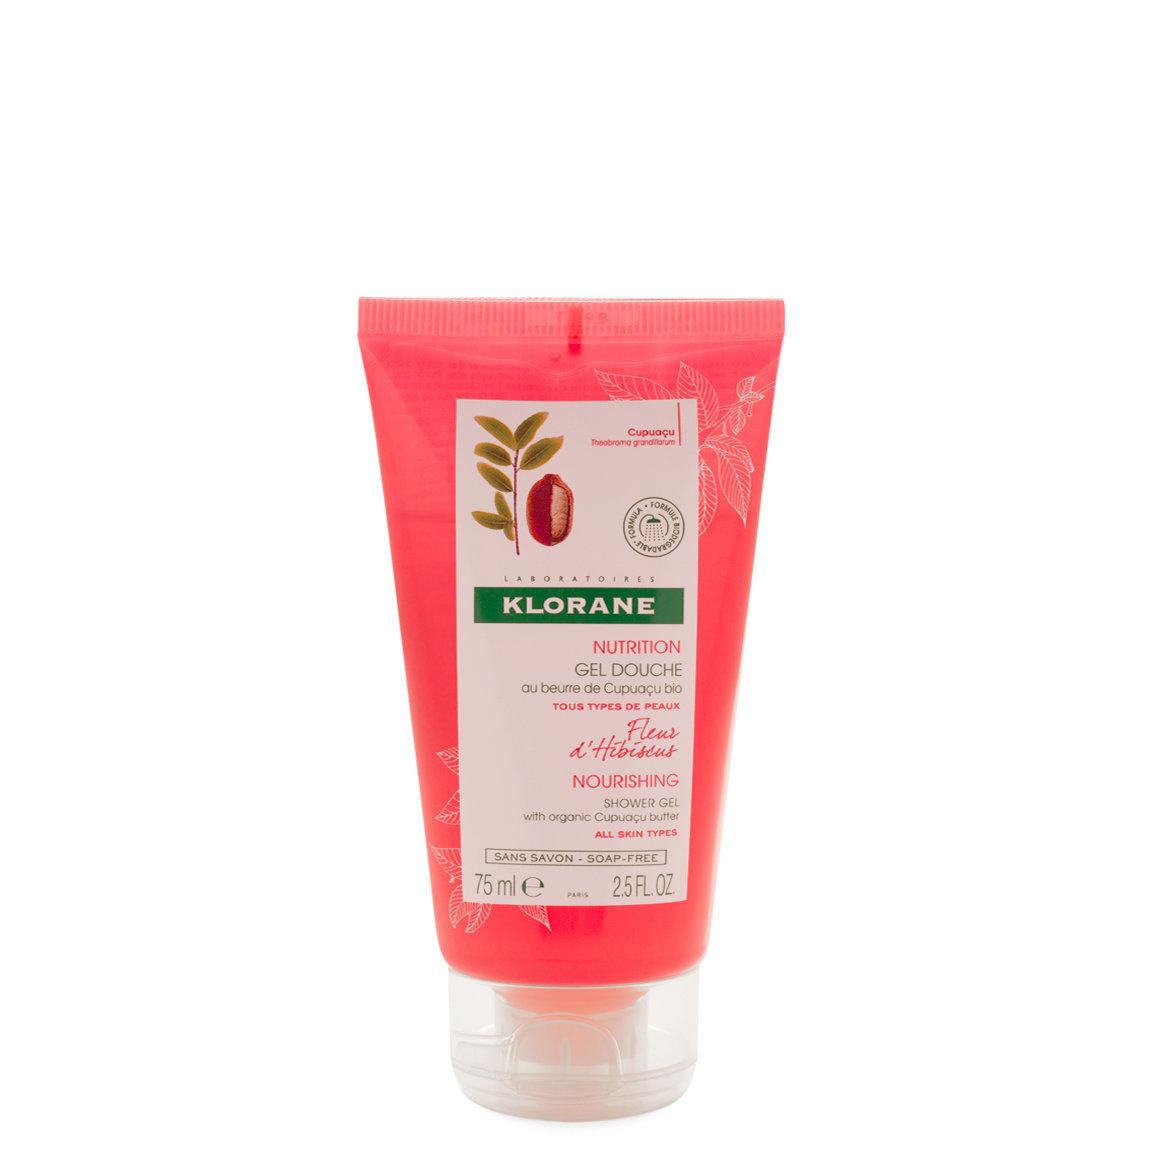 Klorane Hibiscus Flower Shower Gel with Cupuaçu Butter 2.5 fl oz product swatch.